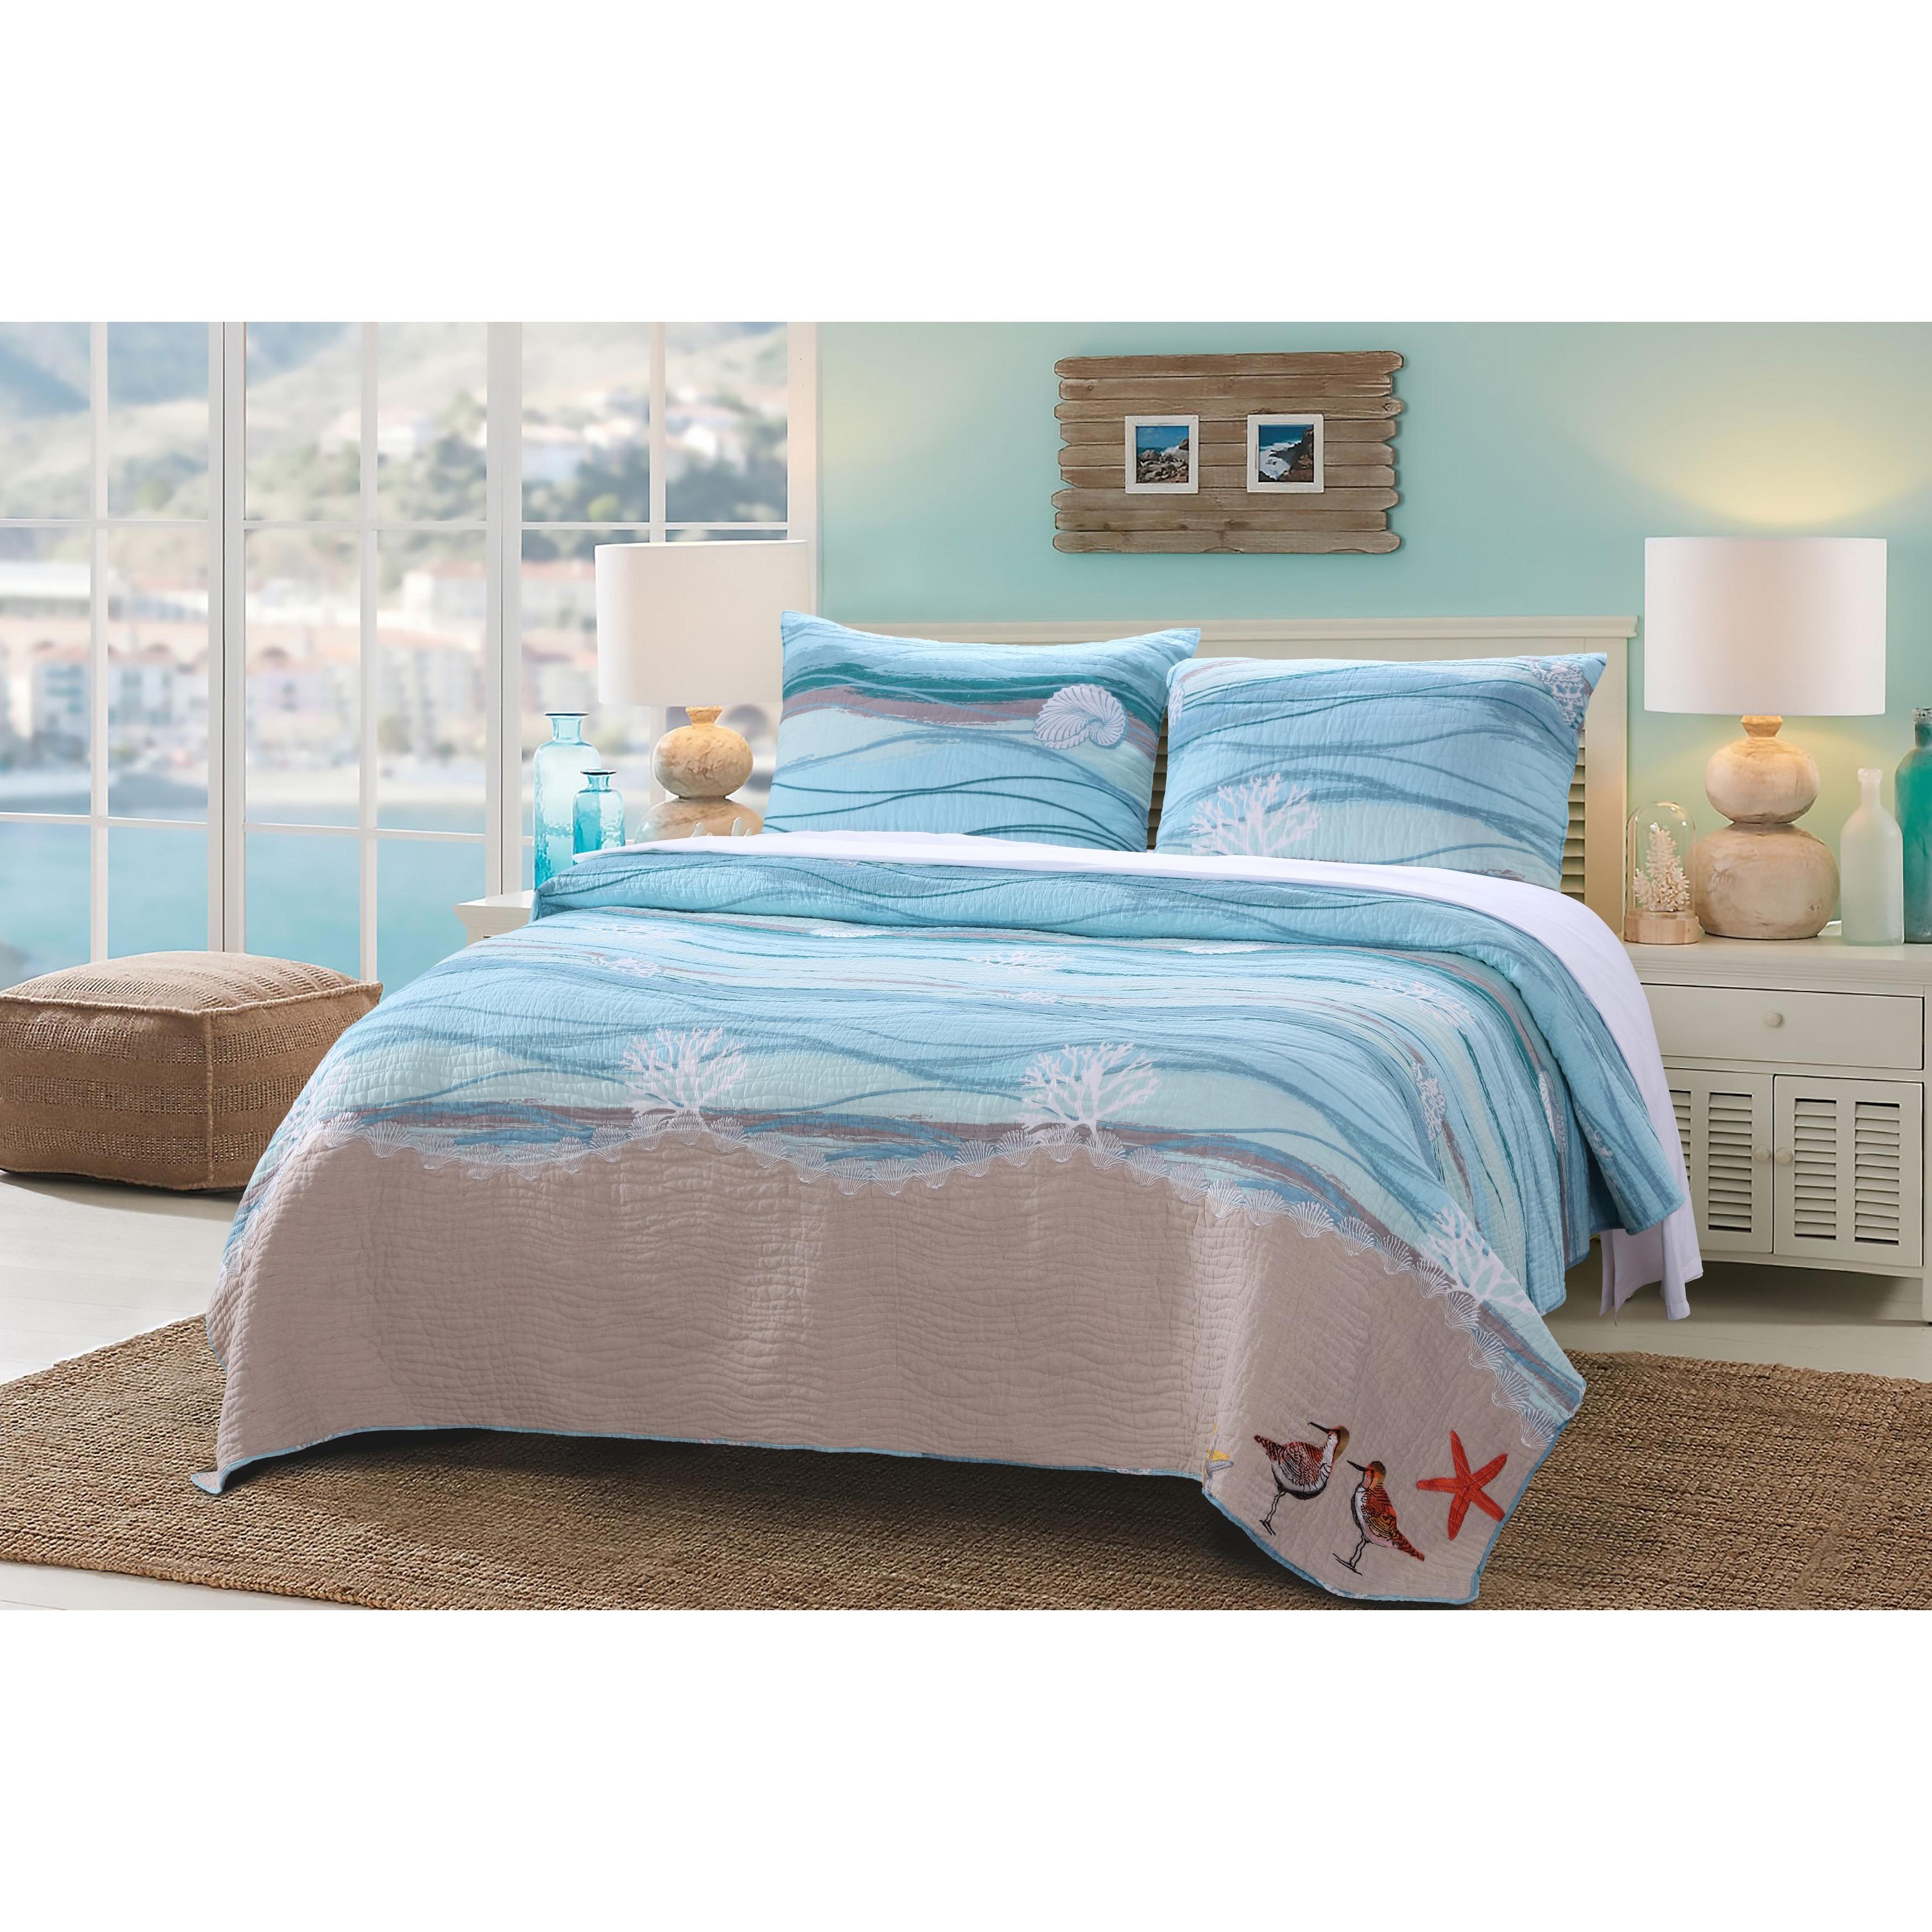 Greenland Trading Maui Coastal Cotton 3-piece Quilt Set (...